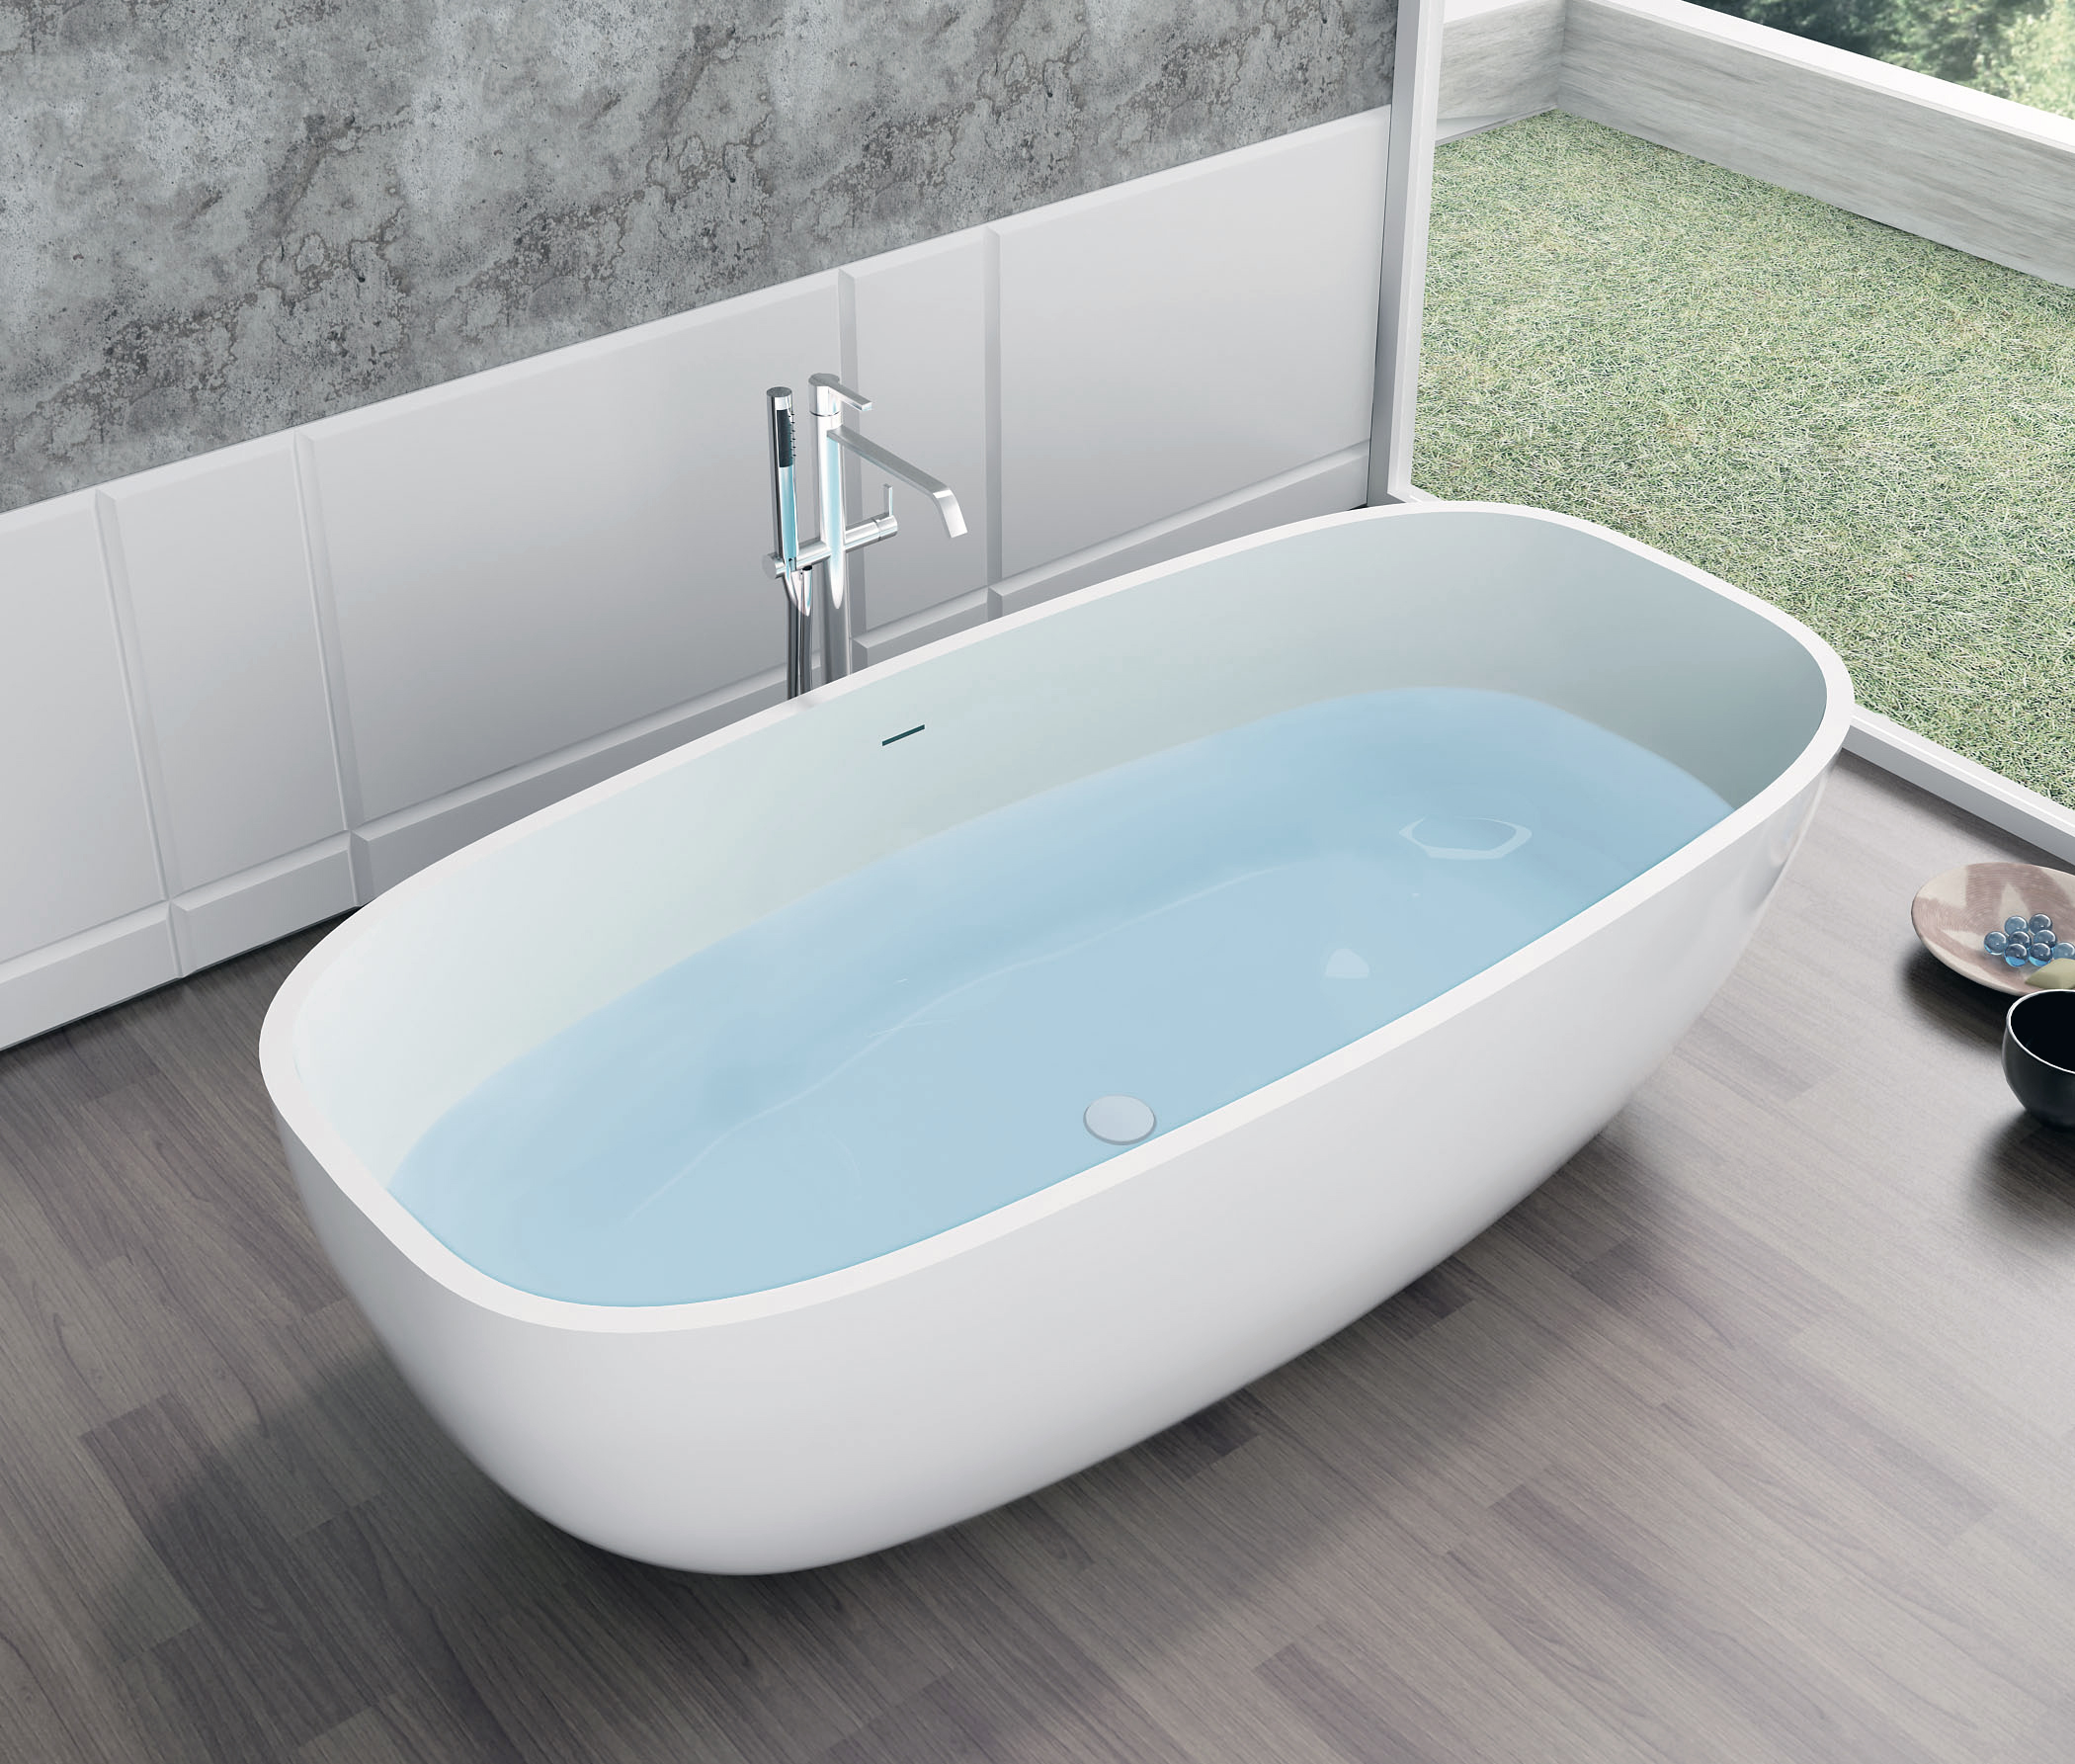 "Vasca da bagno Freestanding""OCEAN""Solid Stone,Scarico ..."